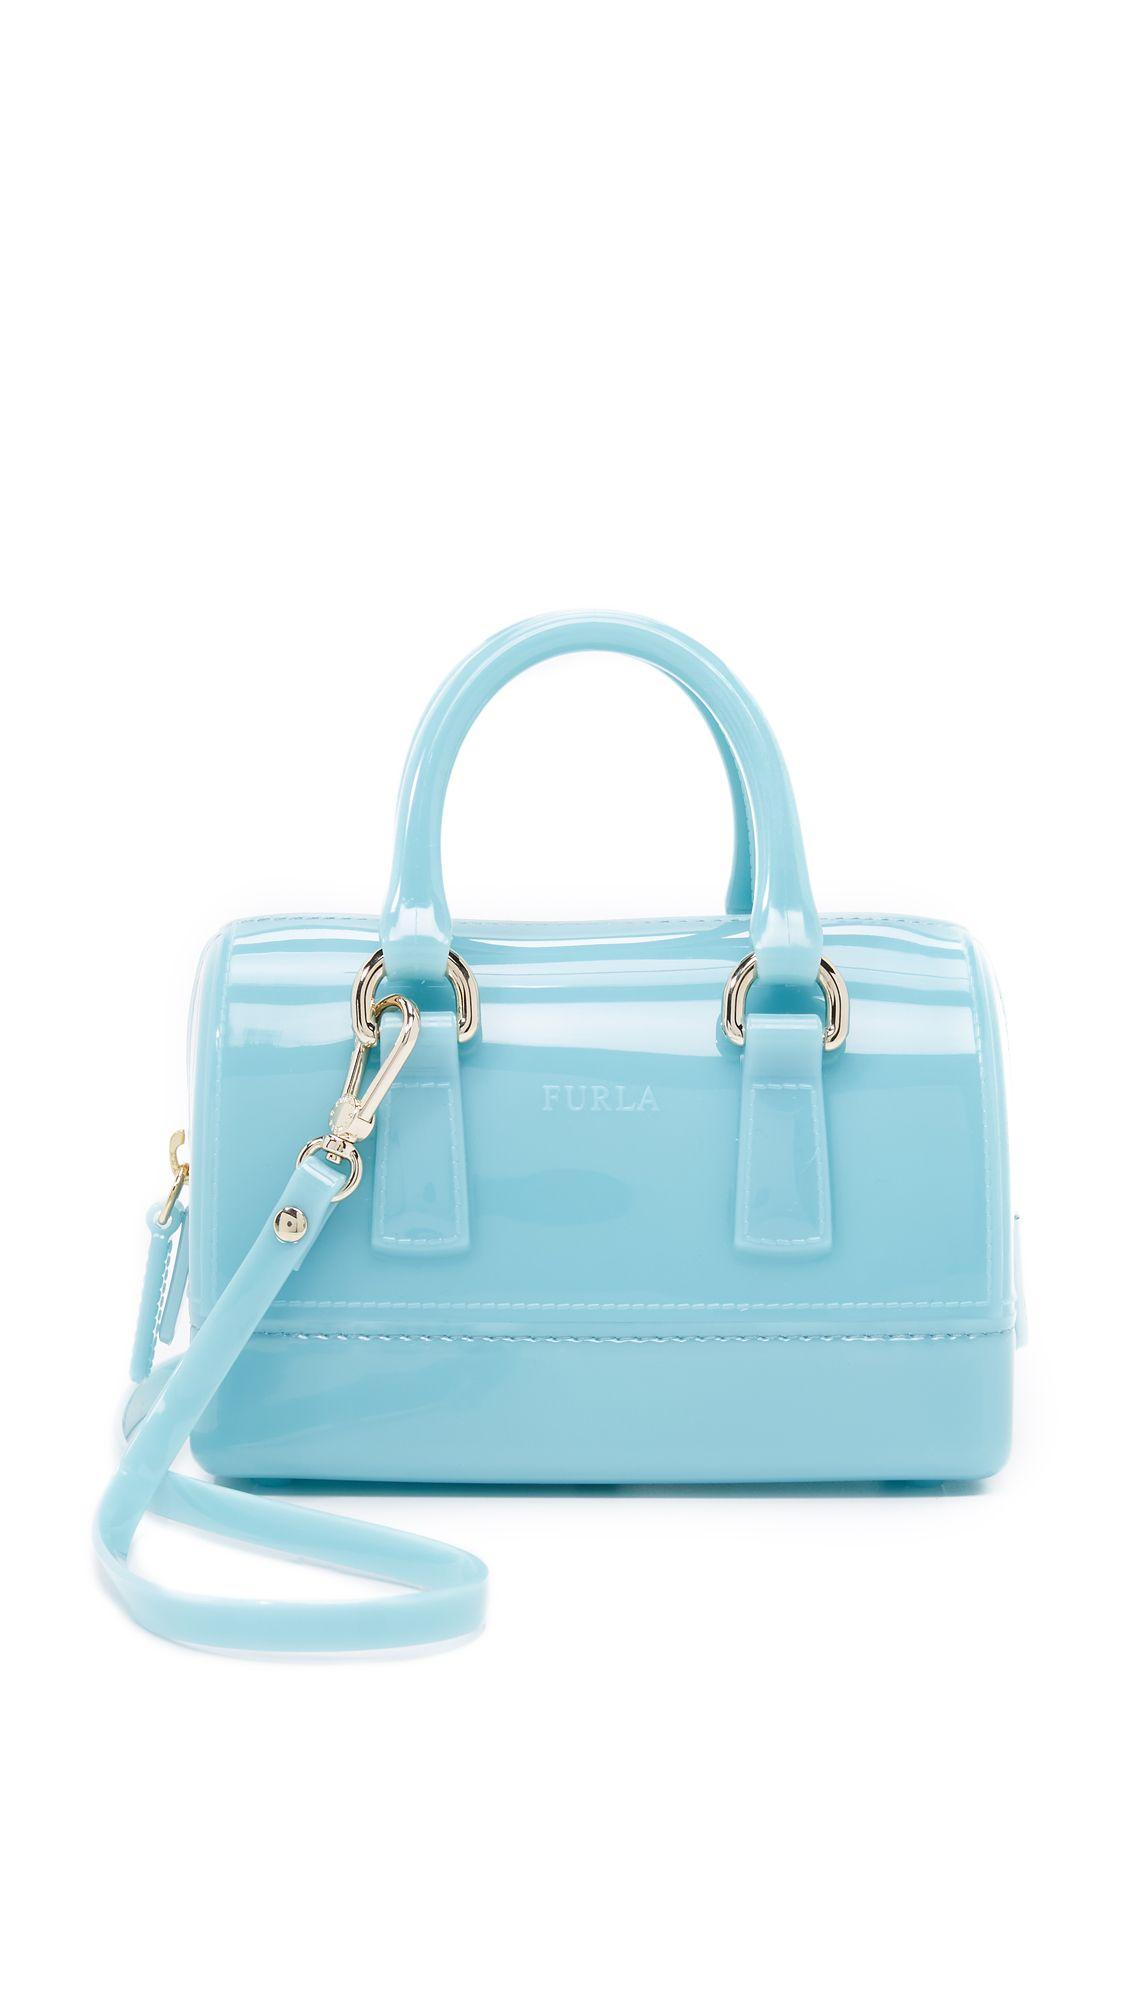 Furla Candy Sweetie Mini Cross Body Bag Aquamarina Shopbop Com